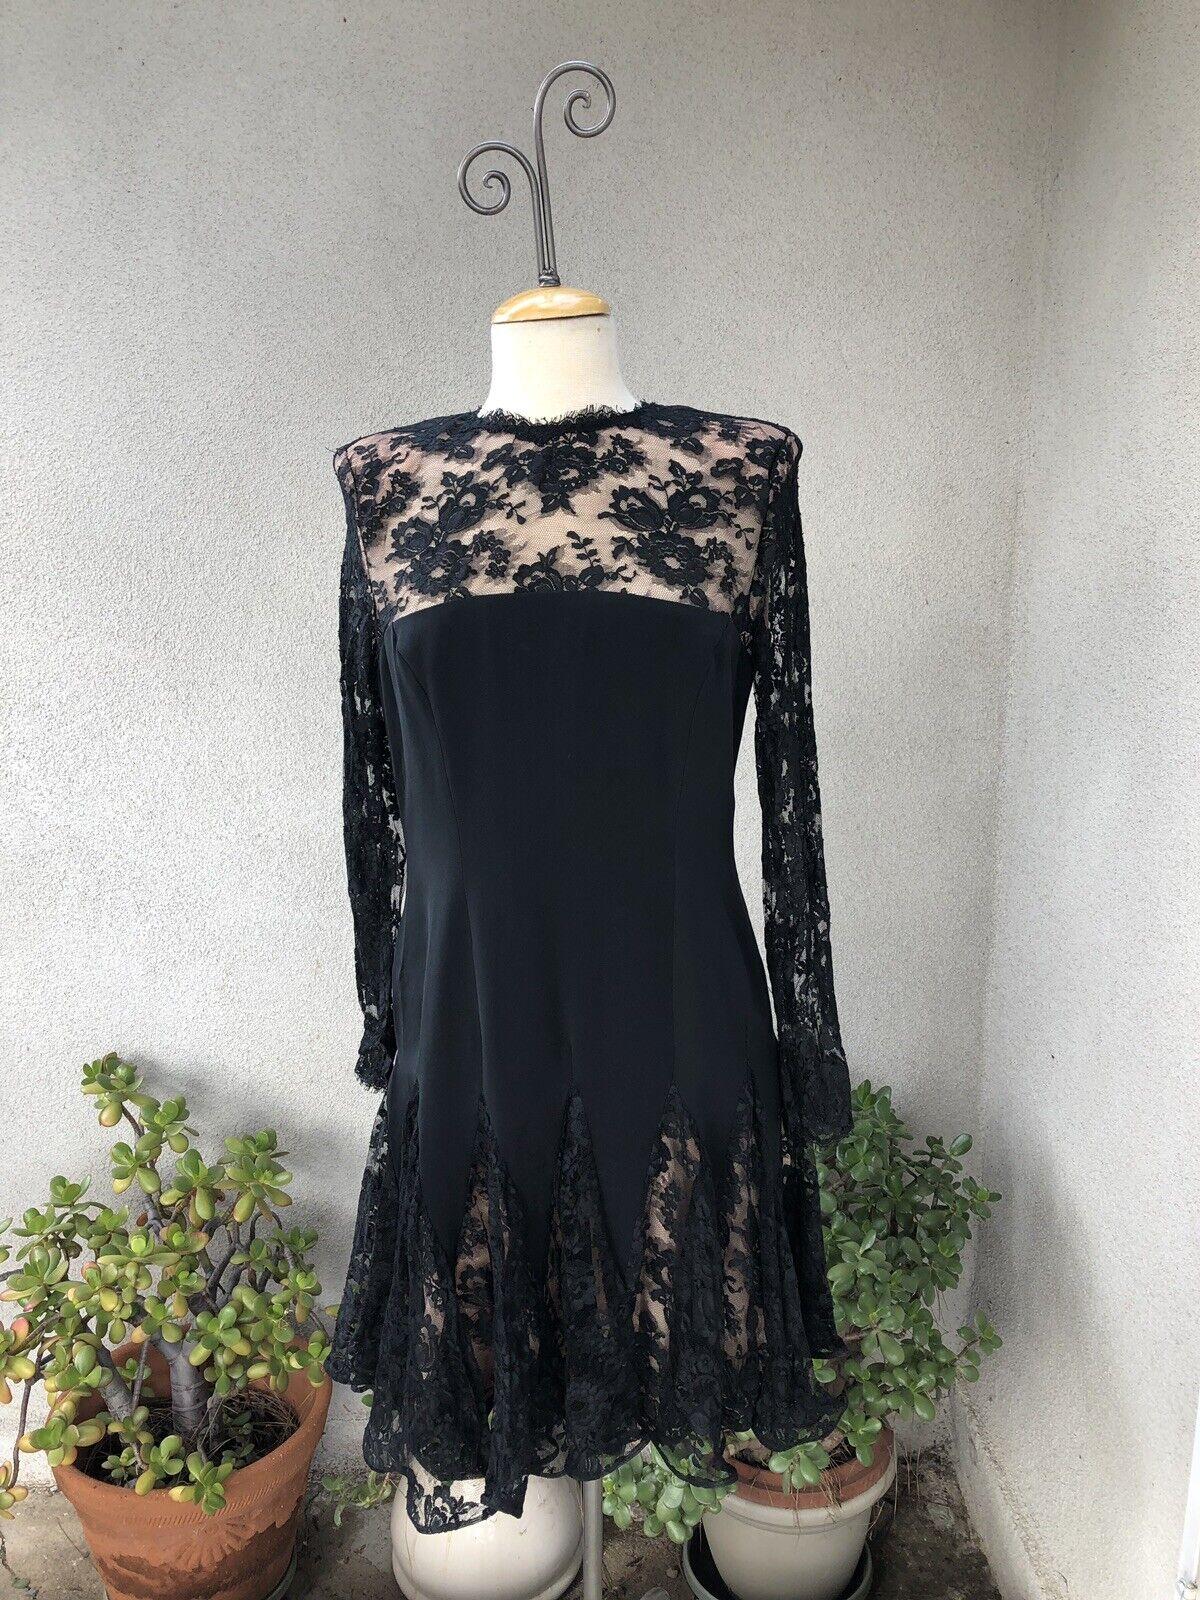 Vintage Black Lace Ruffle Cocktail Dress Travilla… - image 1